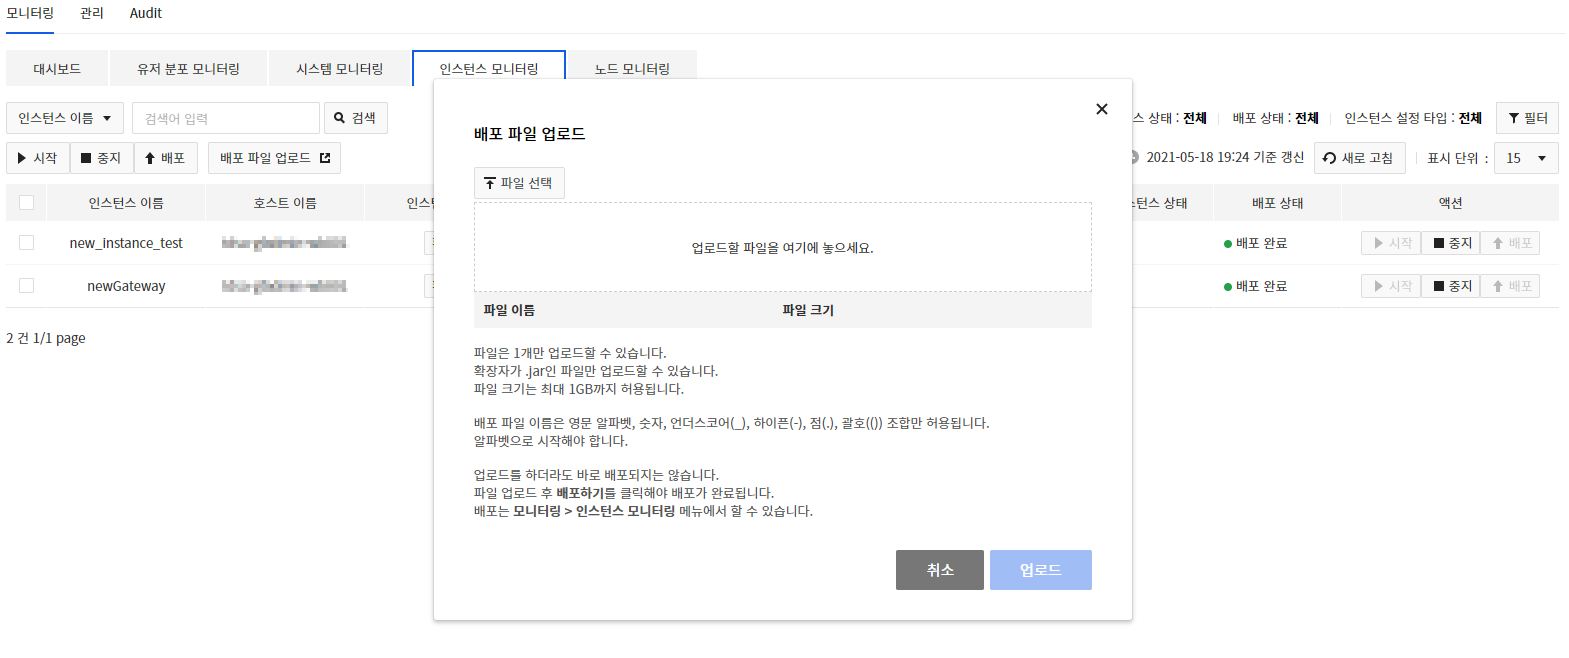 monitoring_instance_upload